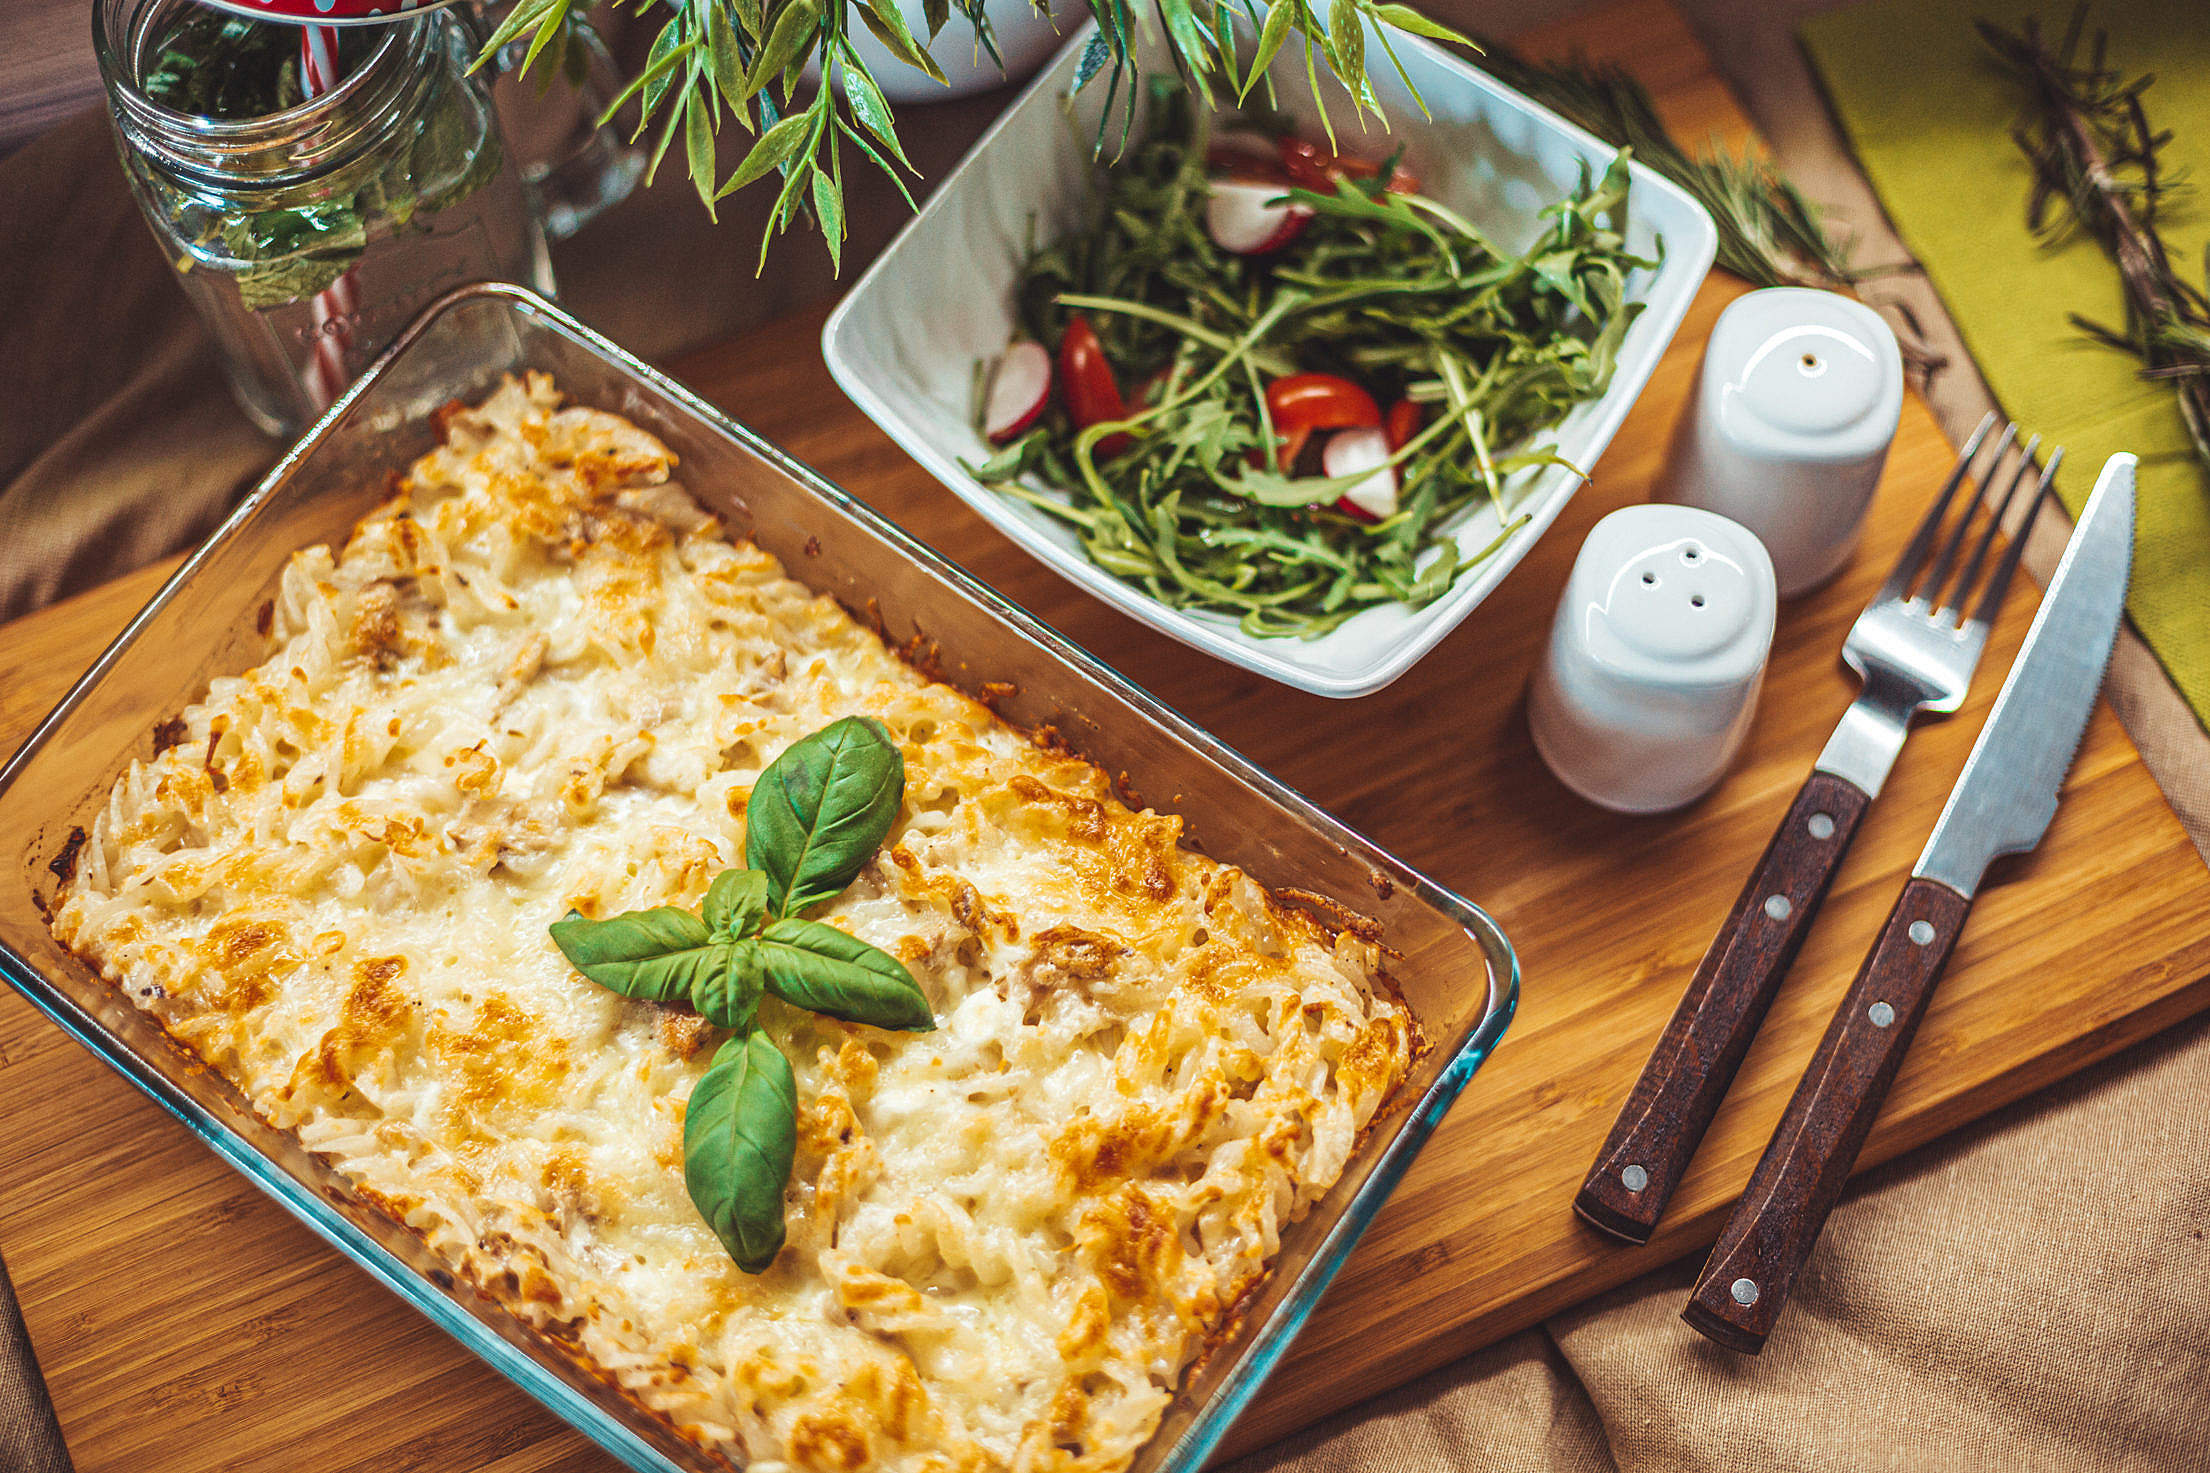 Tuna Pasta Bake Free Stock Photo